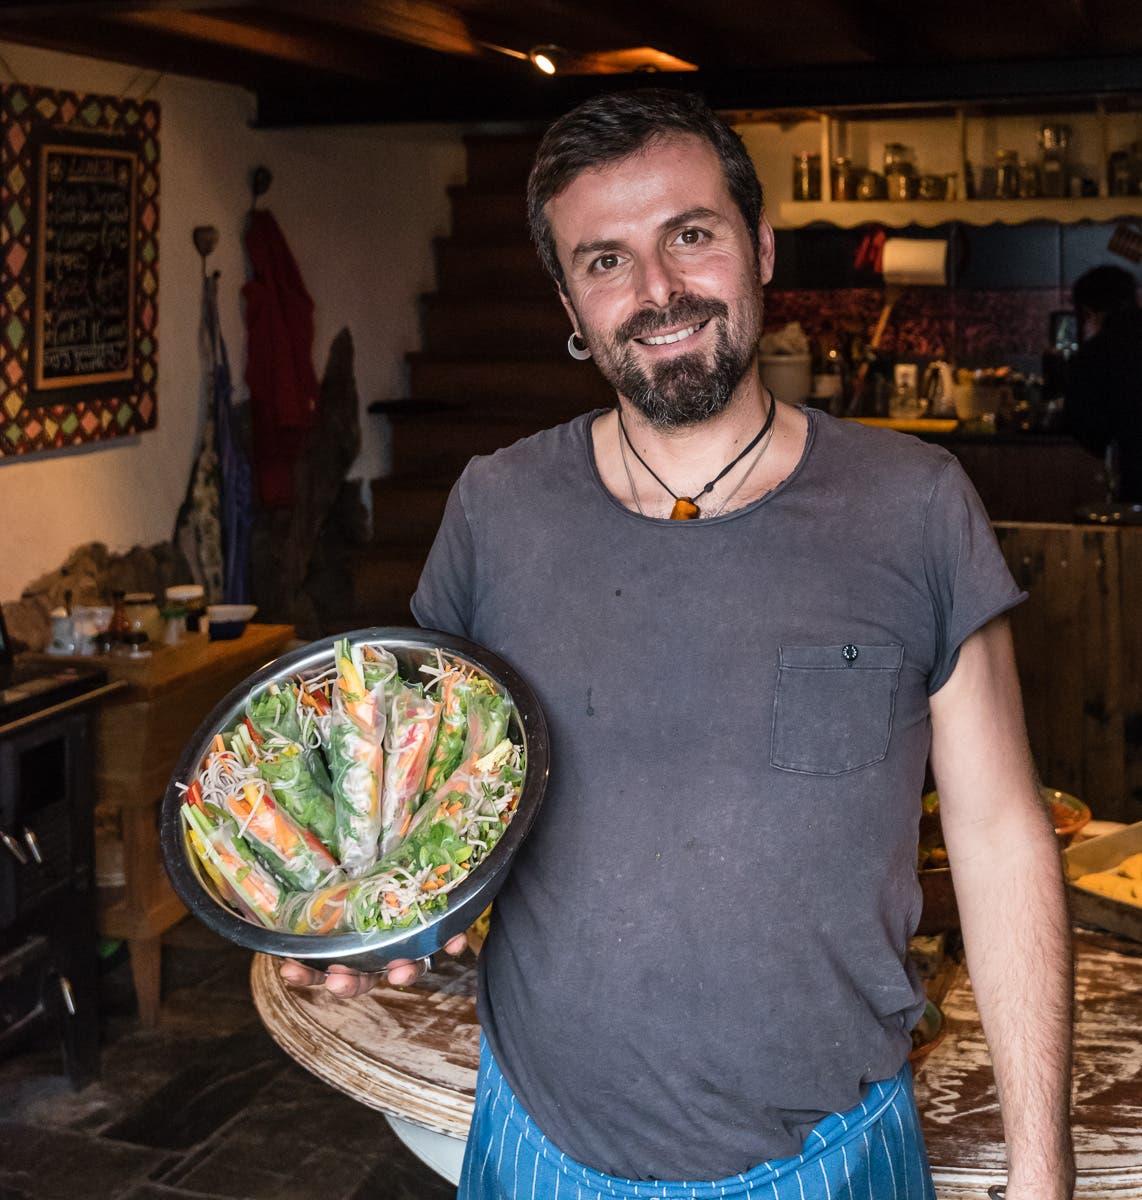 Happy, healthy, holy in Vale de Moses - Clean Eating: Vegetarisch und ayurvisch inspiriert